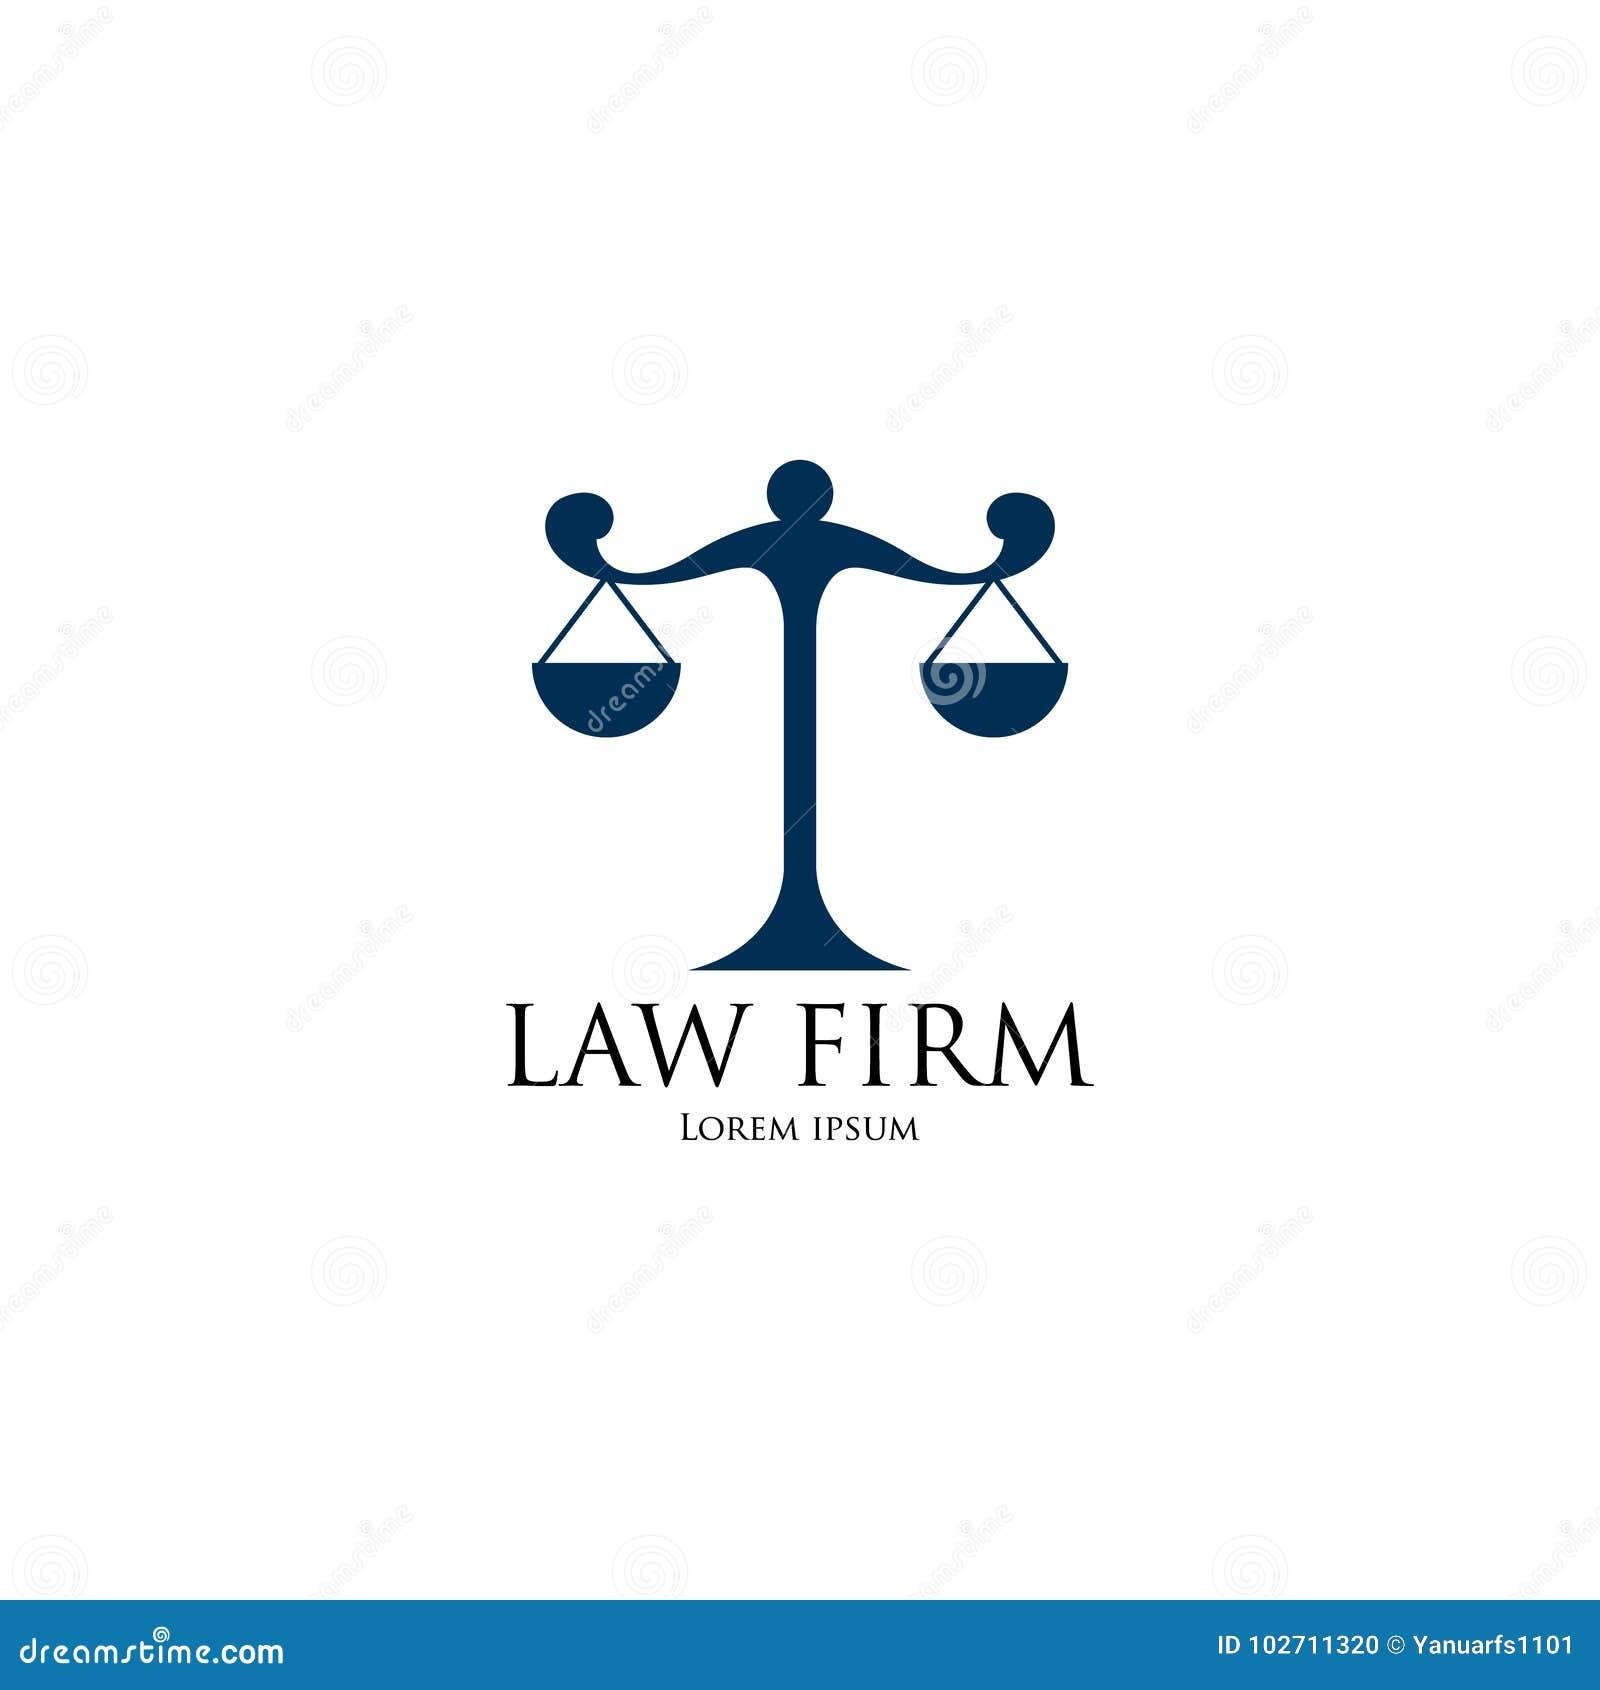 Law Firm Logo art stock vector. Illustration of legal - 102711320